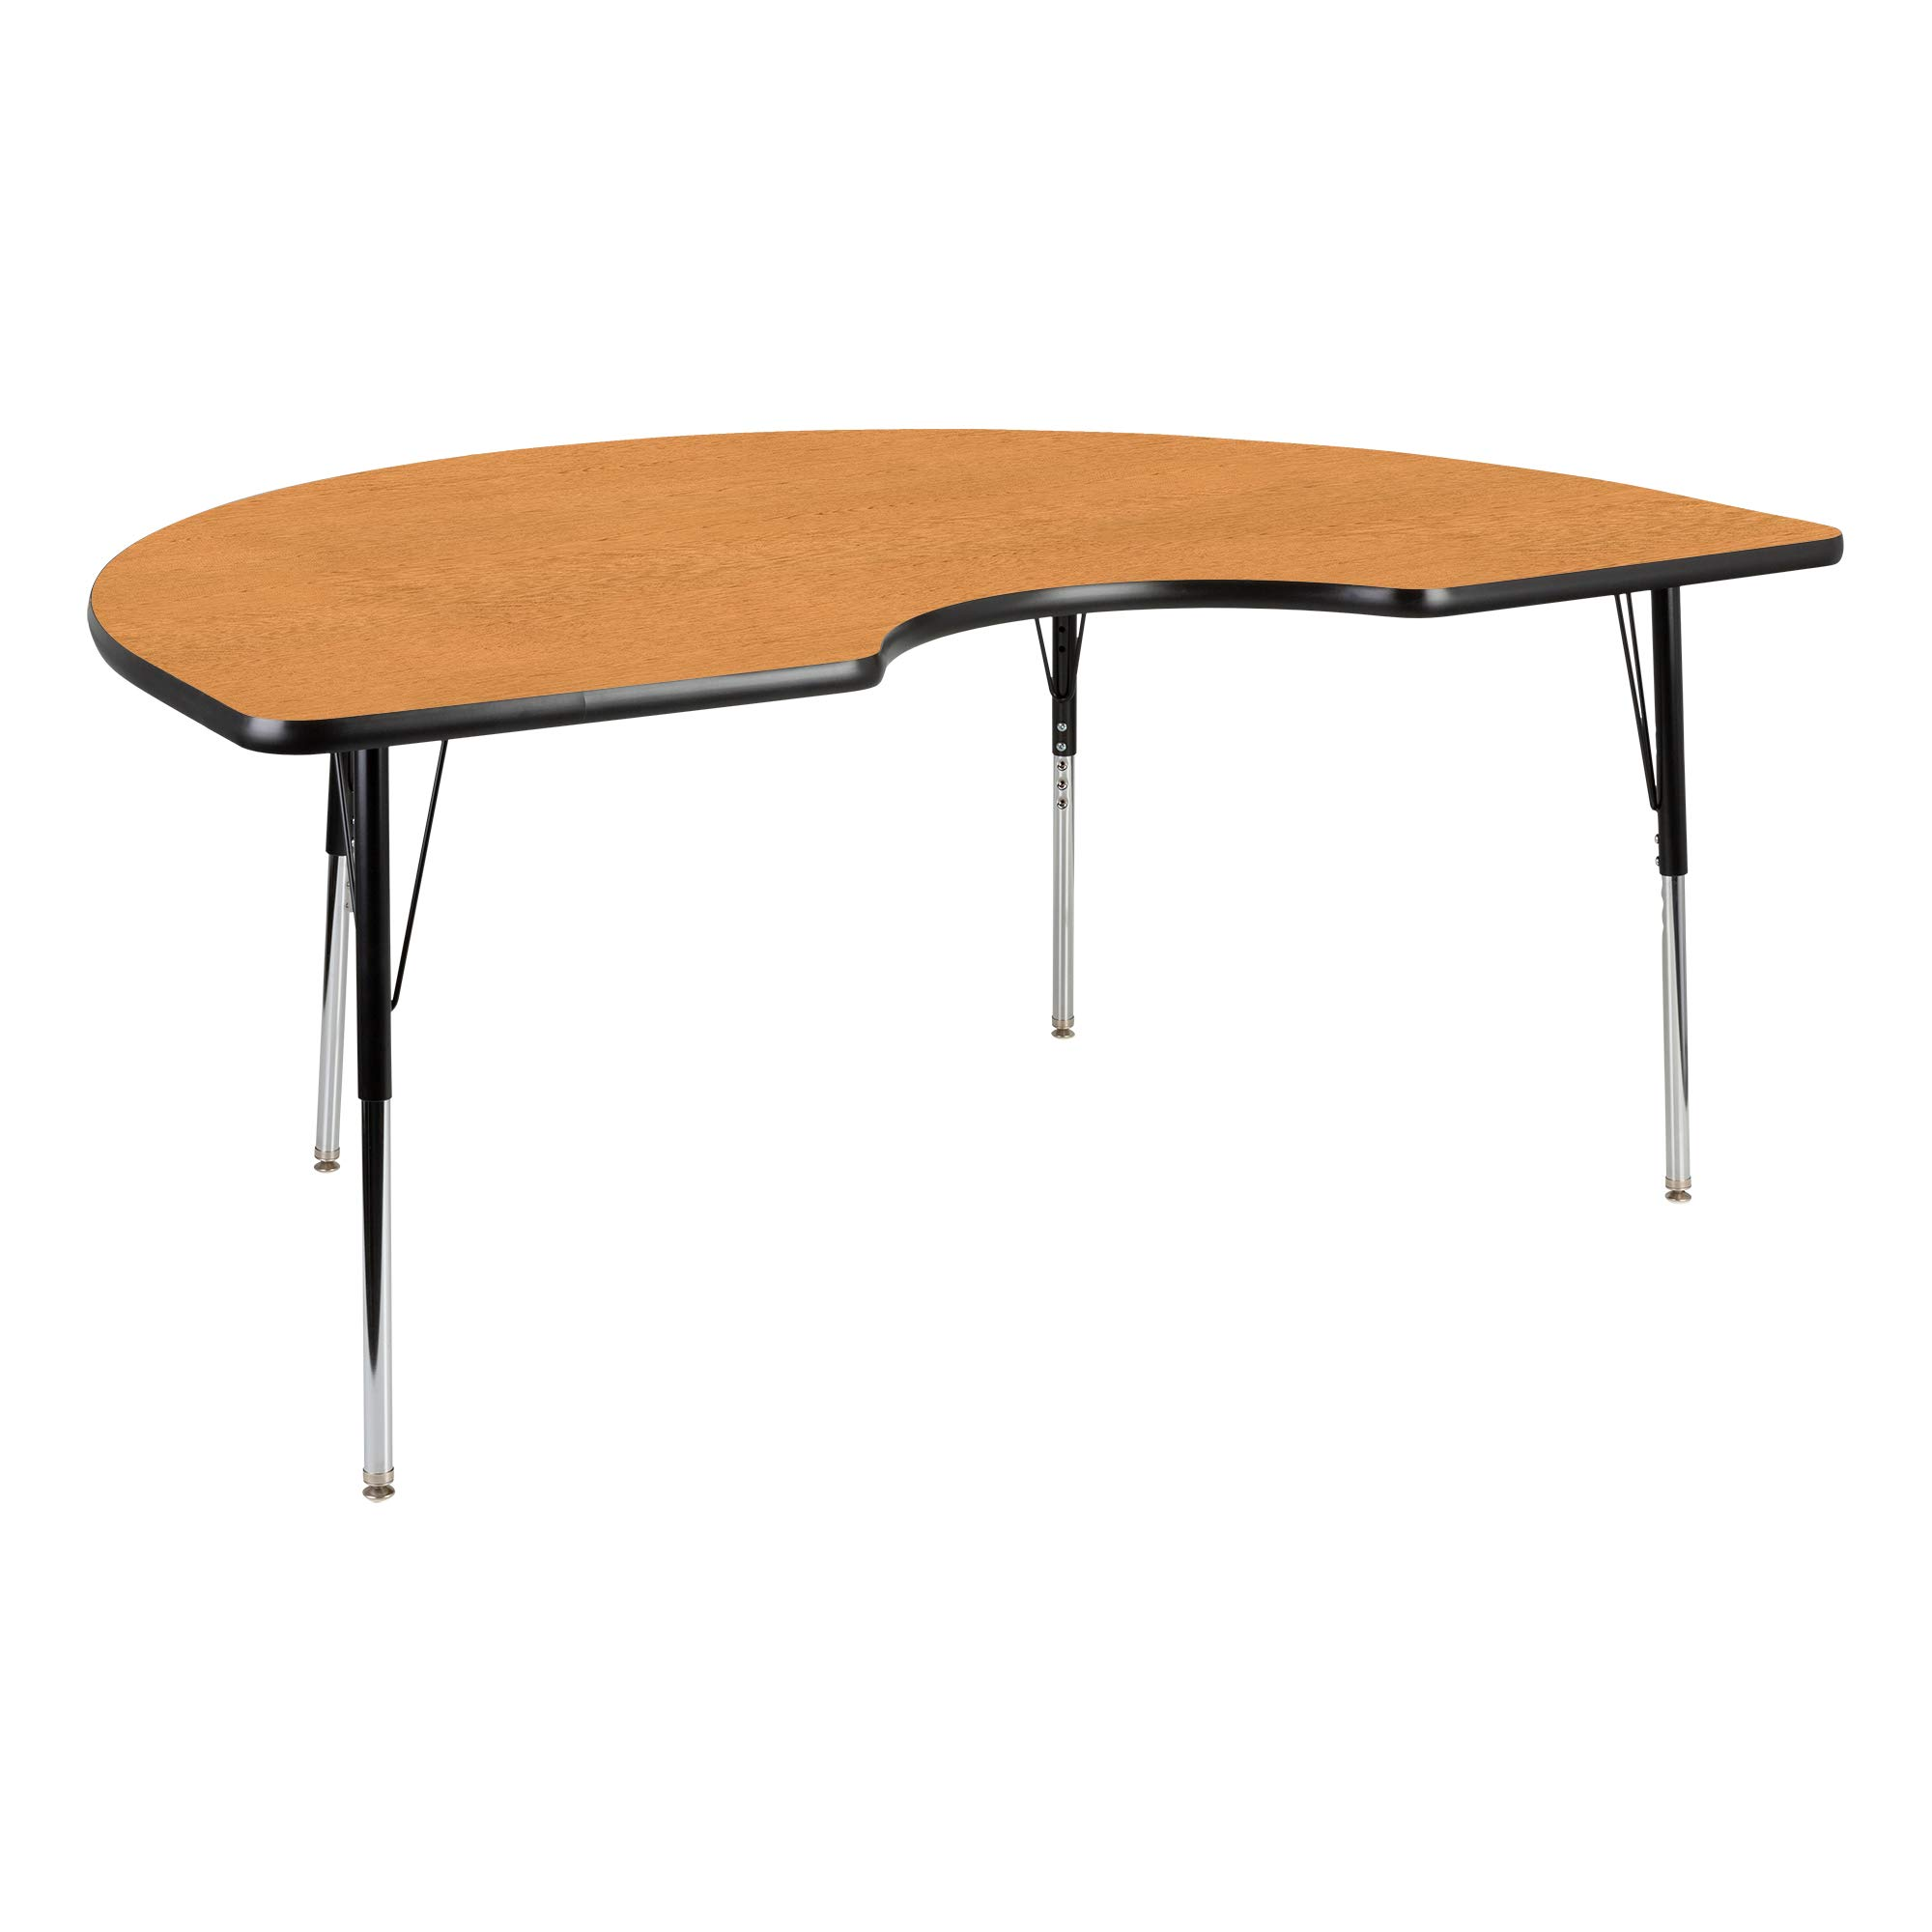 Kidney Adjustable Height School Classroom Activity Table - Oak Top/Black Edge